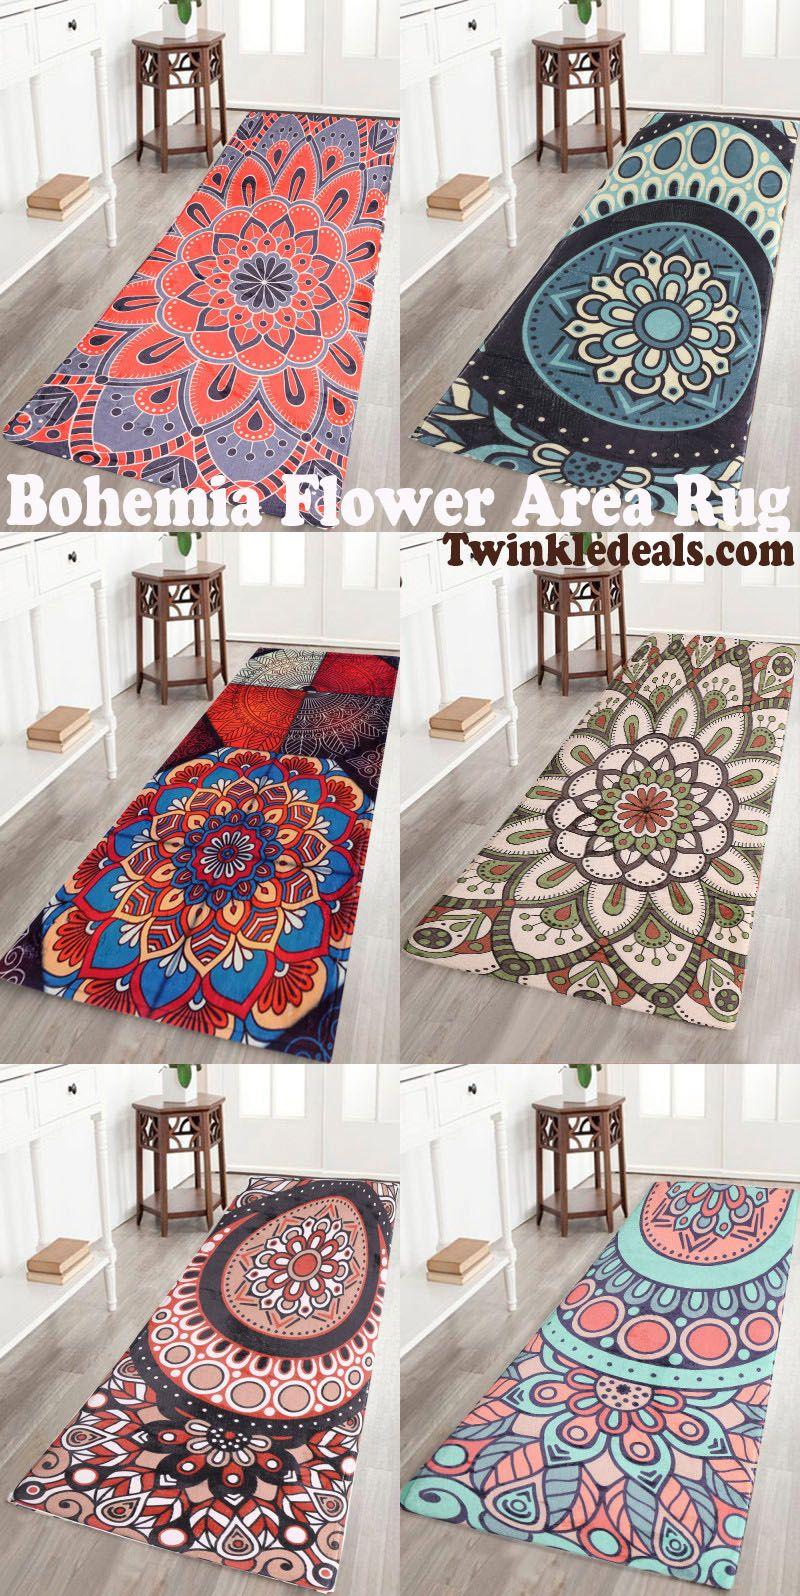 Muebles Bohemia - Bohemia Flower Area Rug Mekan Pinterest Mandalas Mosaicos Y [mjhdah]https://s-media-cache-ak0.pinimg.com/originals/0f/e2/0f/0fe20f5adb33320302e876060ce25929.jpg